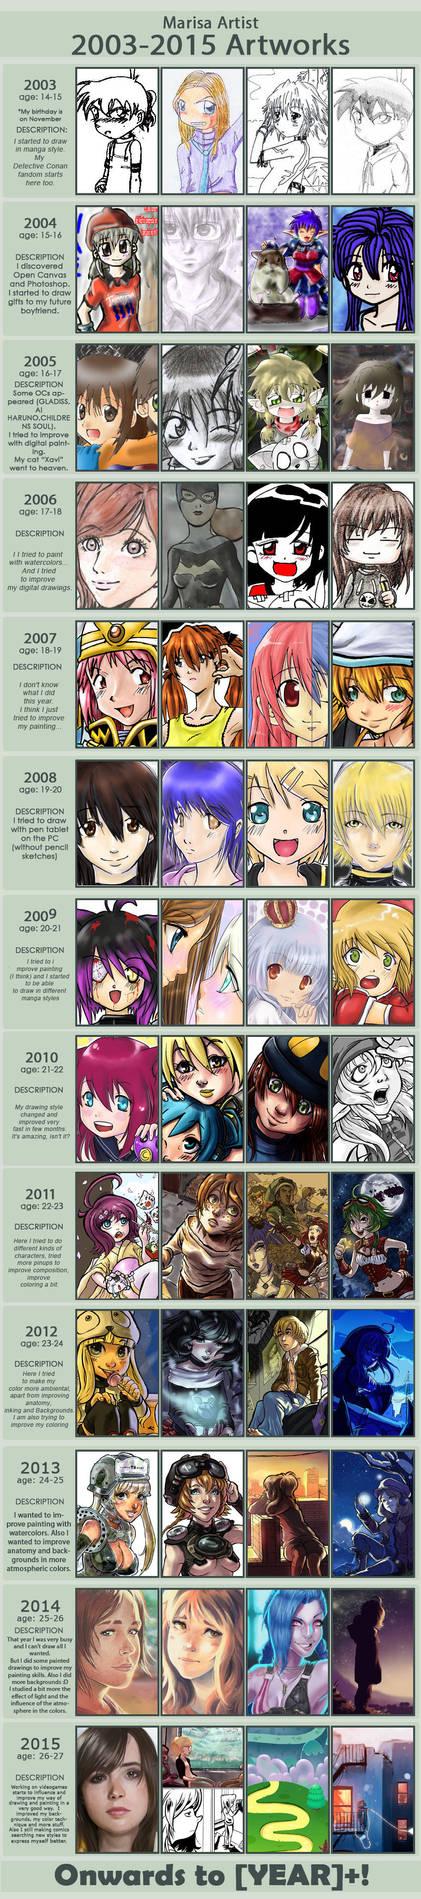 My improvement meme 2003 to 2015